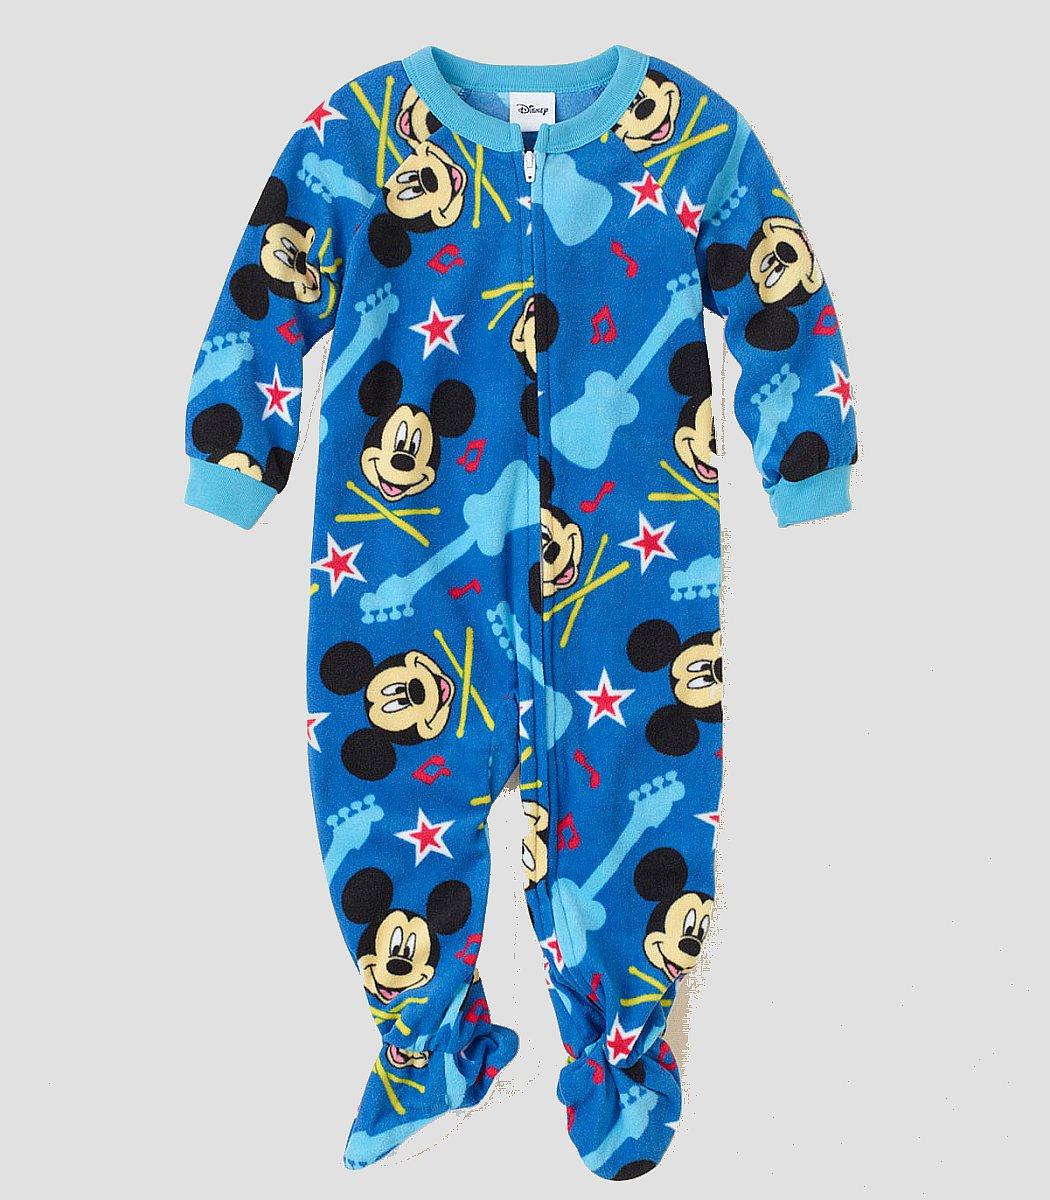 DISNEY MICKEY MOUSE ROCK Boy's 4T Blue Fleece Footed Pajama Sleeper